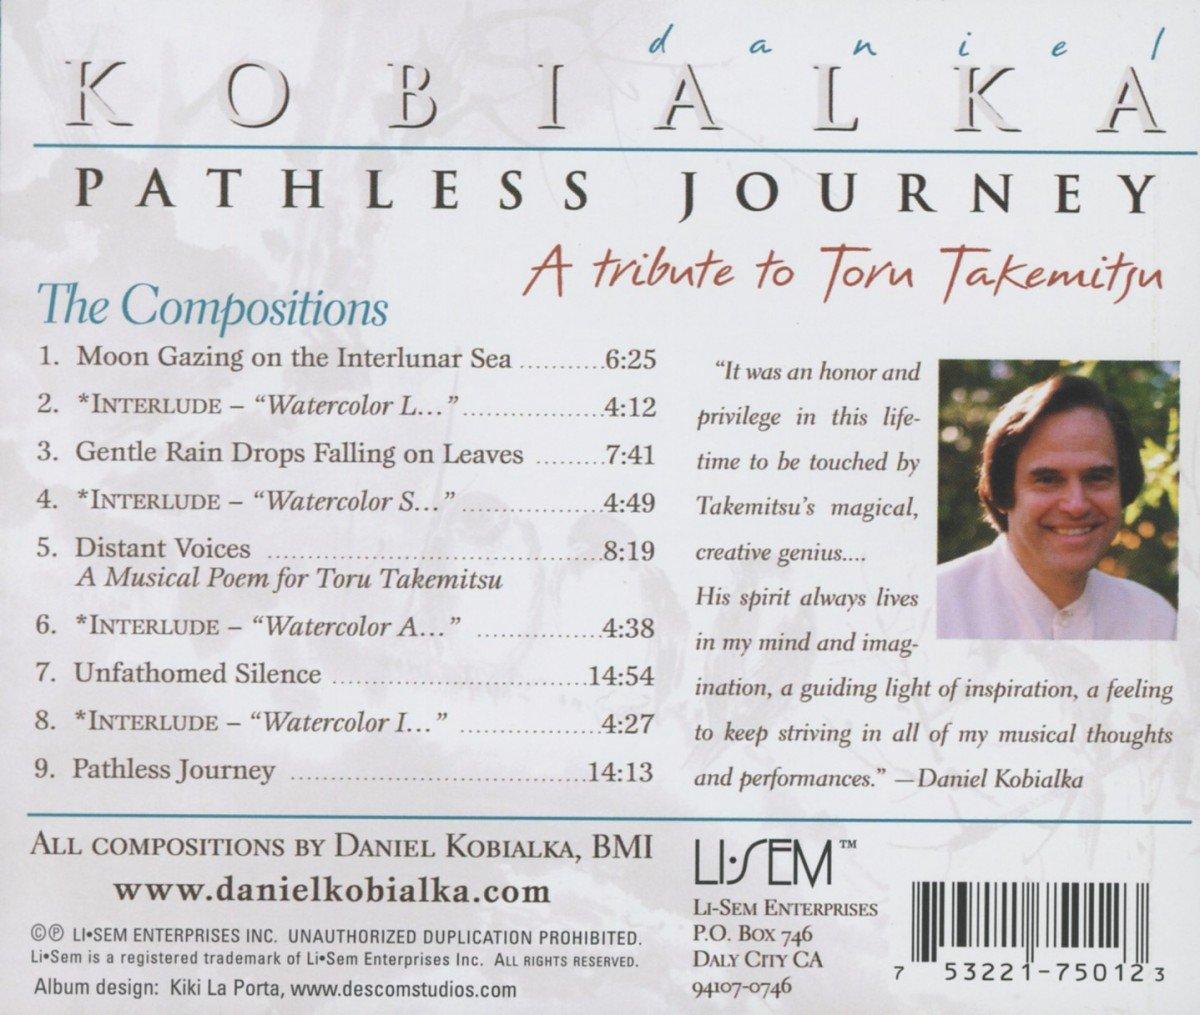 Kobialka: Pathless Journey (A Tribute to Toru Takemitsu) by Li-sem Enterprises